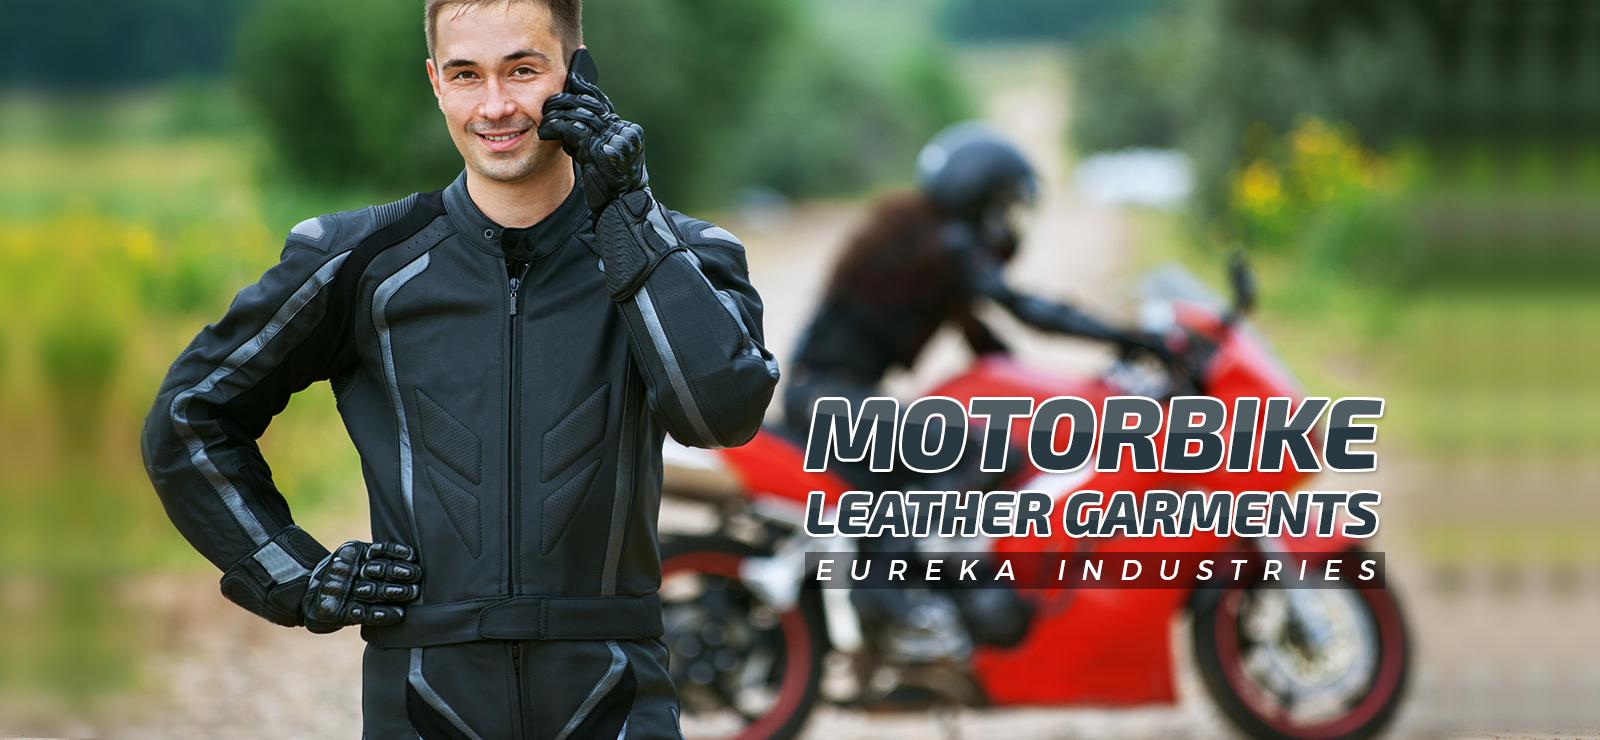 Motorbike Leather Garments-1